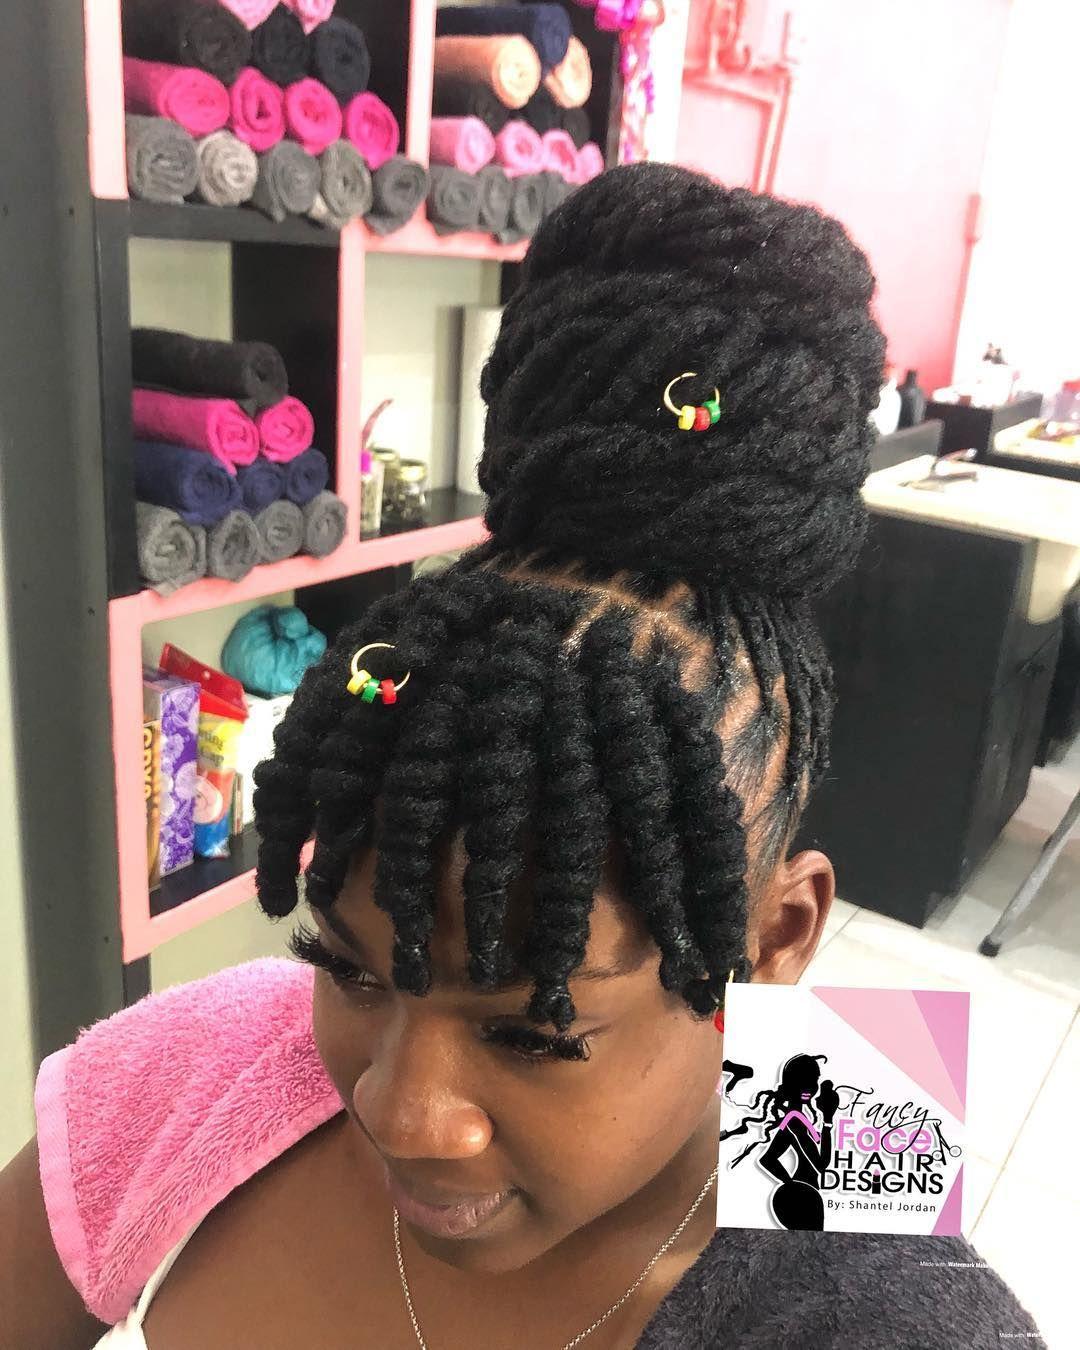 11 Months A Length Check Starterlocs Loclivin Locnationthemovement Iamlocd Locology Loccomm Dreadlock Hairstyles Black Hair Styles Locs Hairstyles